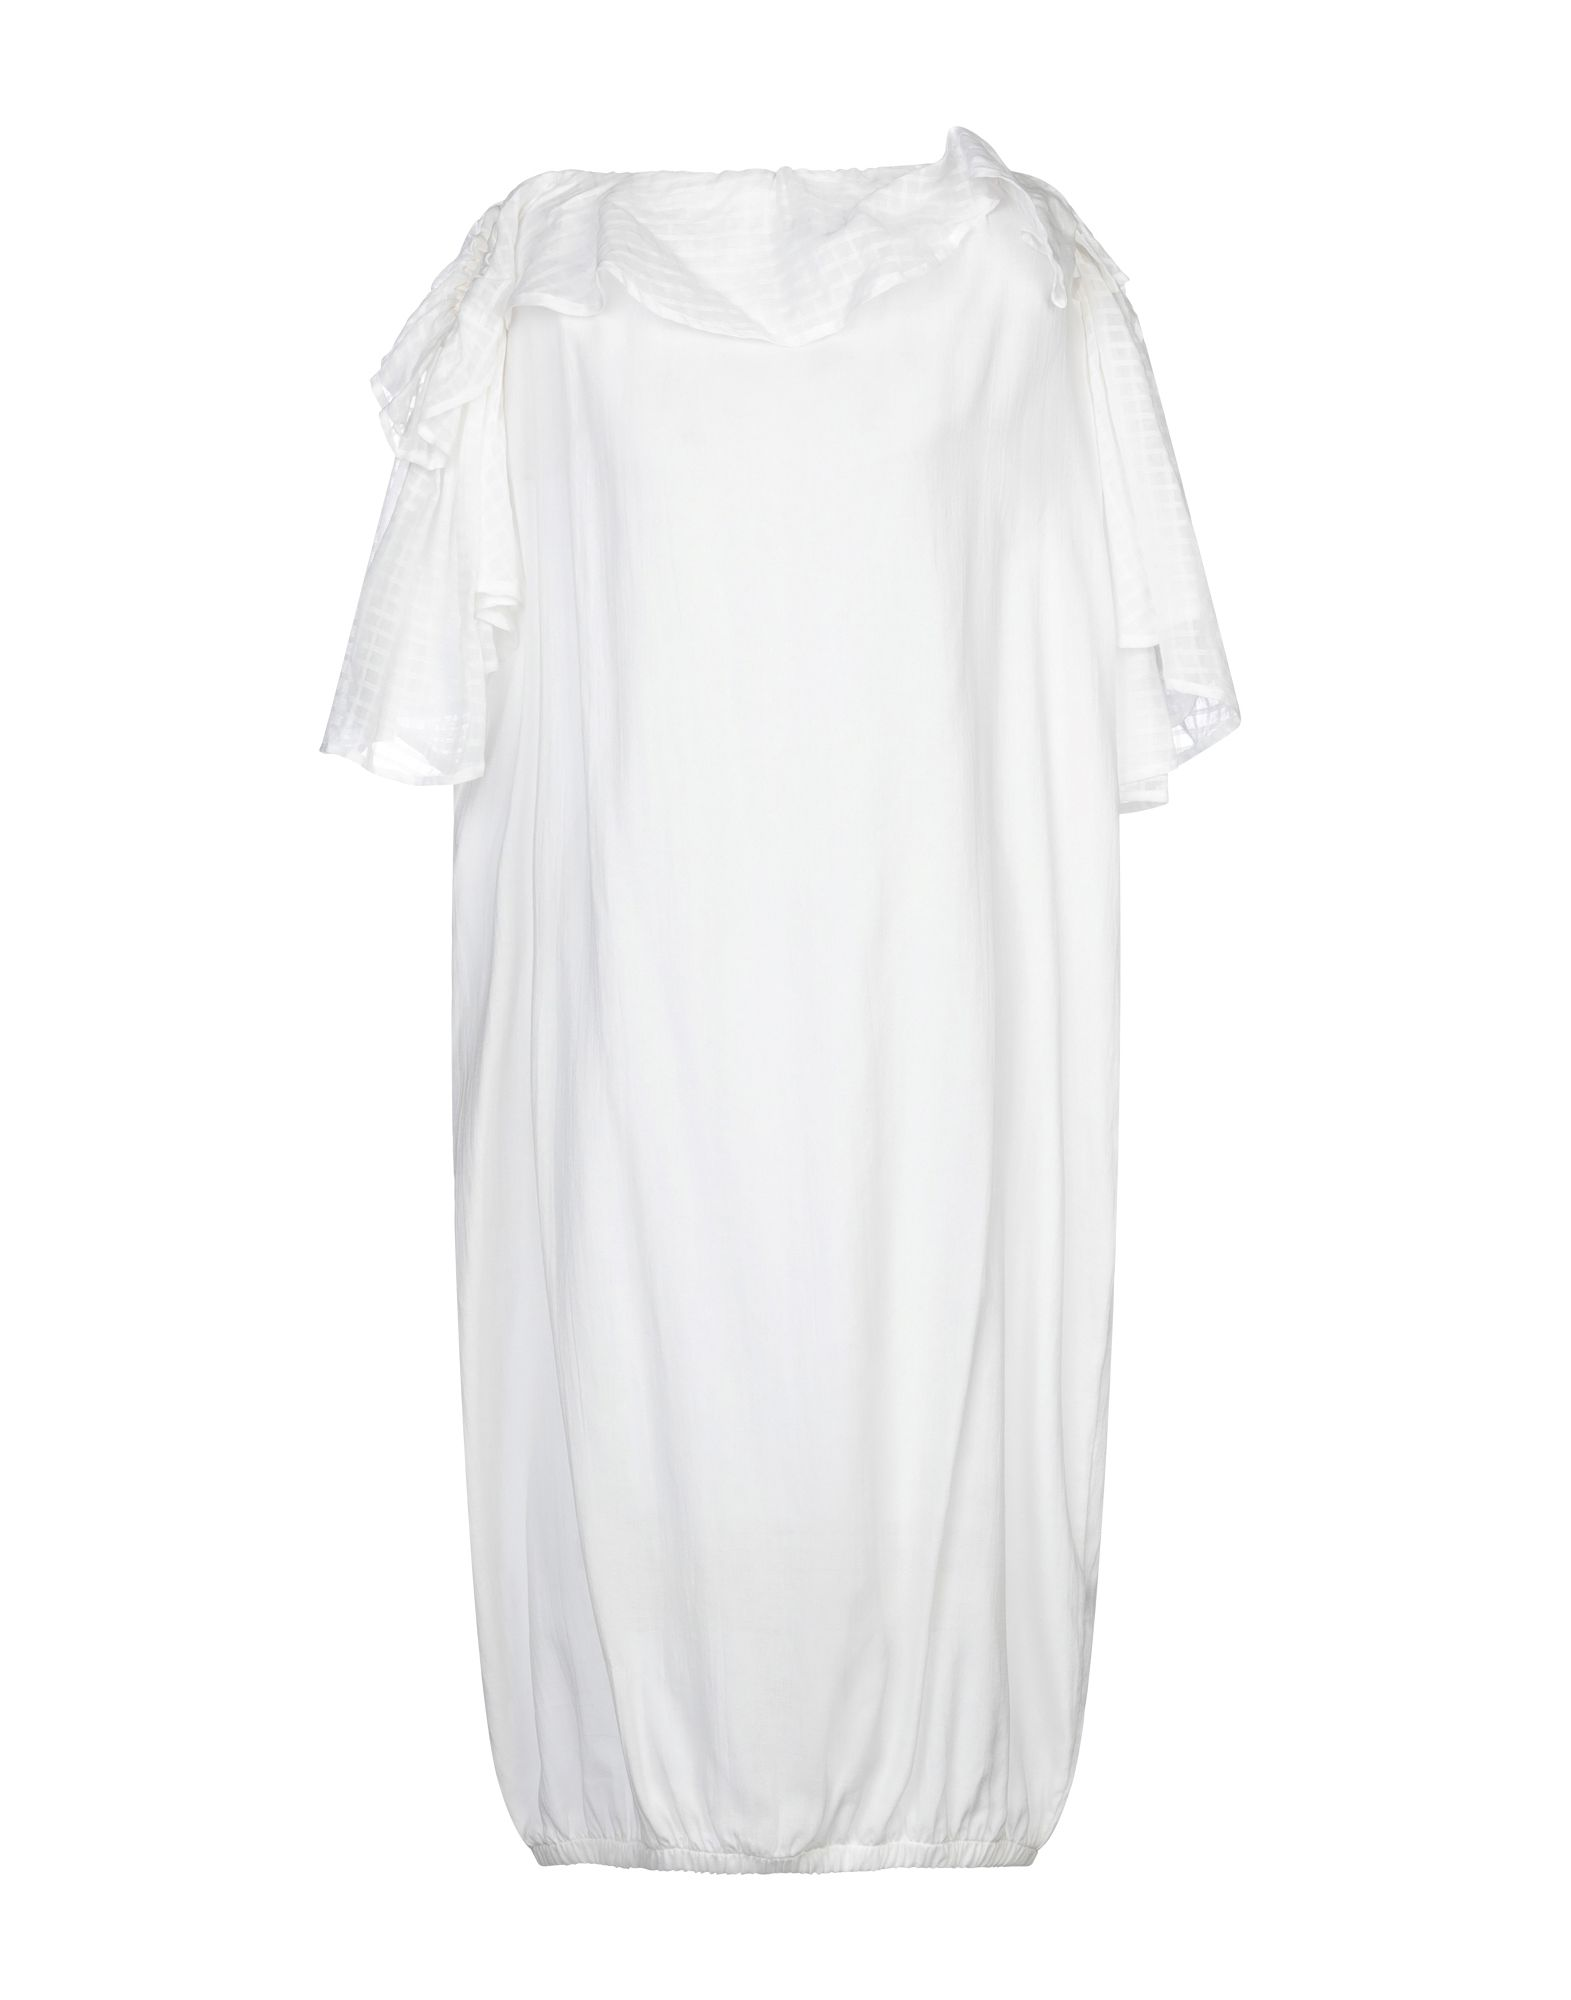 GRAZIA'LLIANI Платье длиной 3/4 casasola платье длиной 3 4